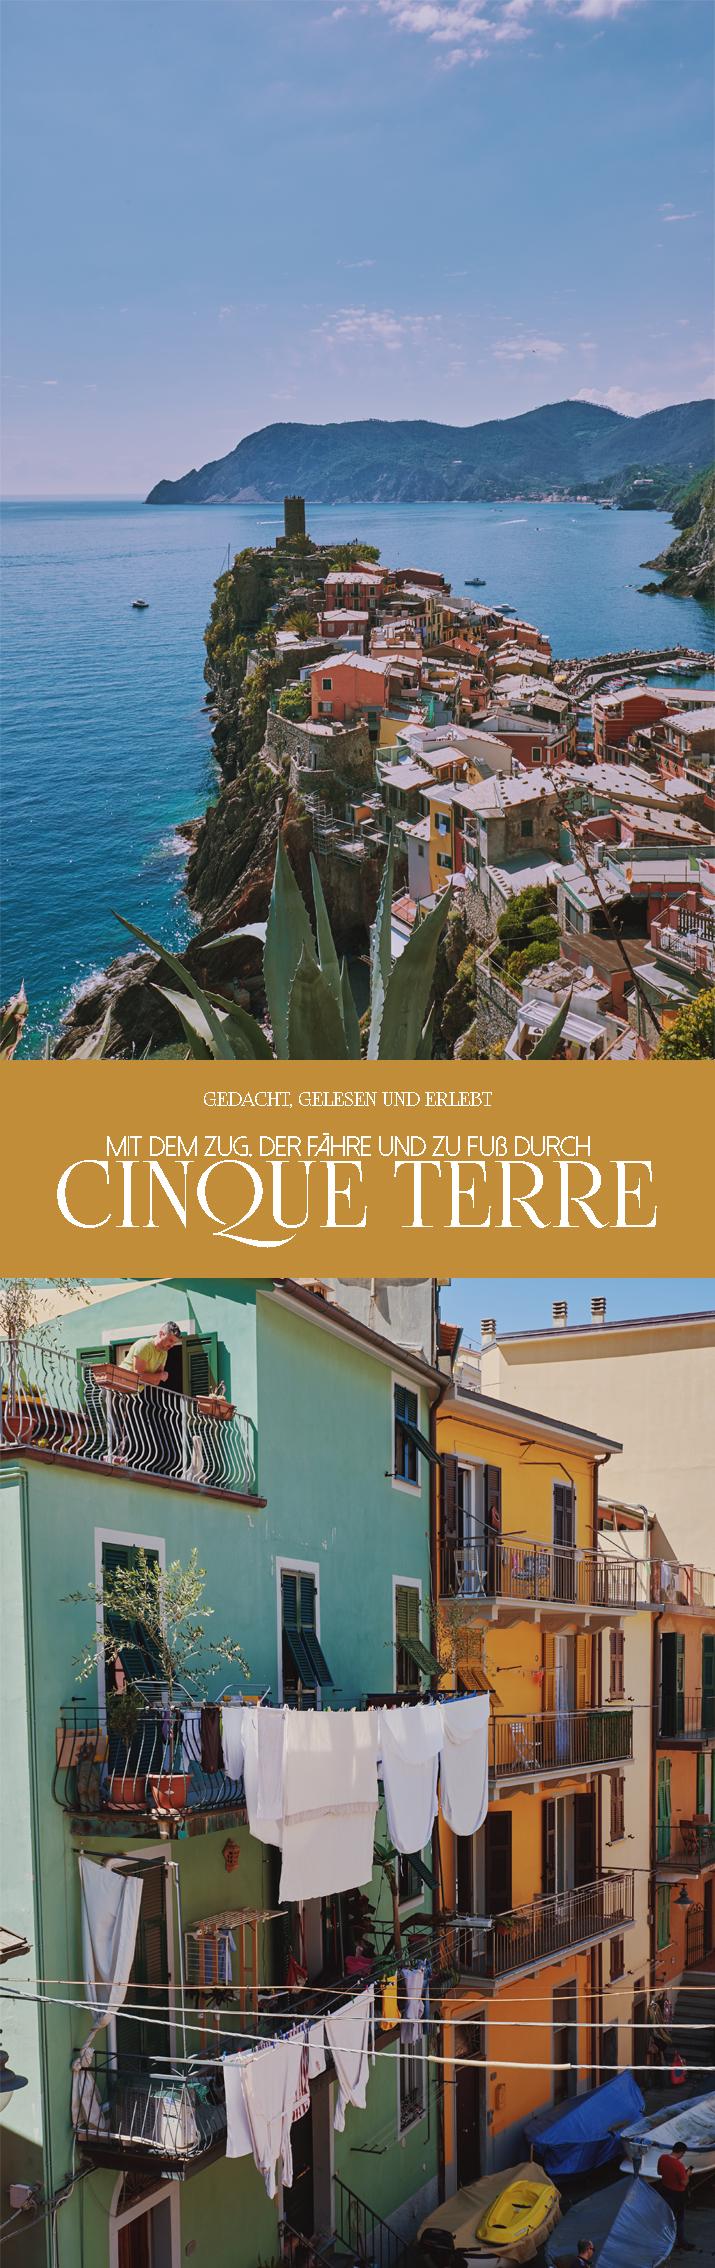 Tipps für Cinque Terre